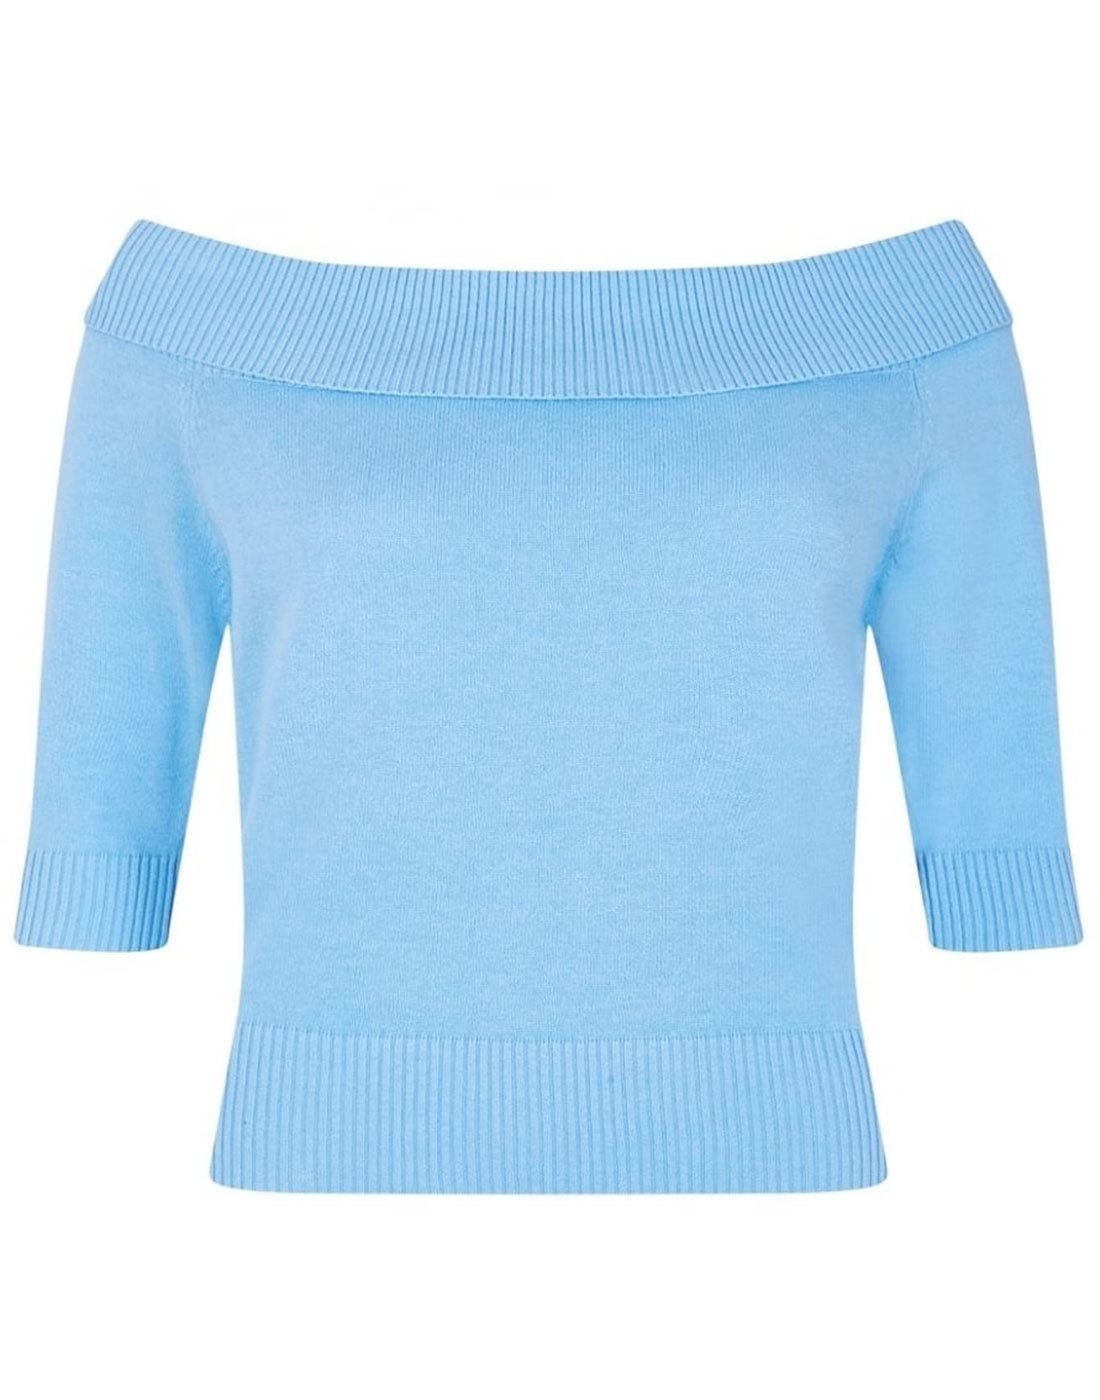 9f6823a9b24 COLLECTIF Vintage Bridgette 50s Mod Knit Bardot Top in Bluebell